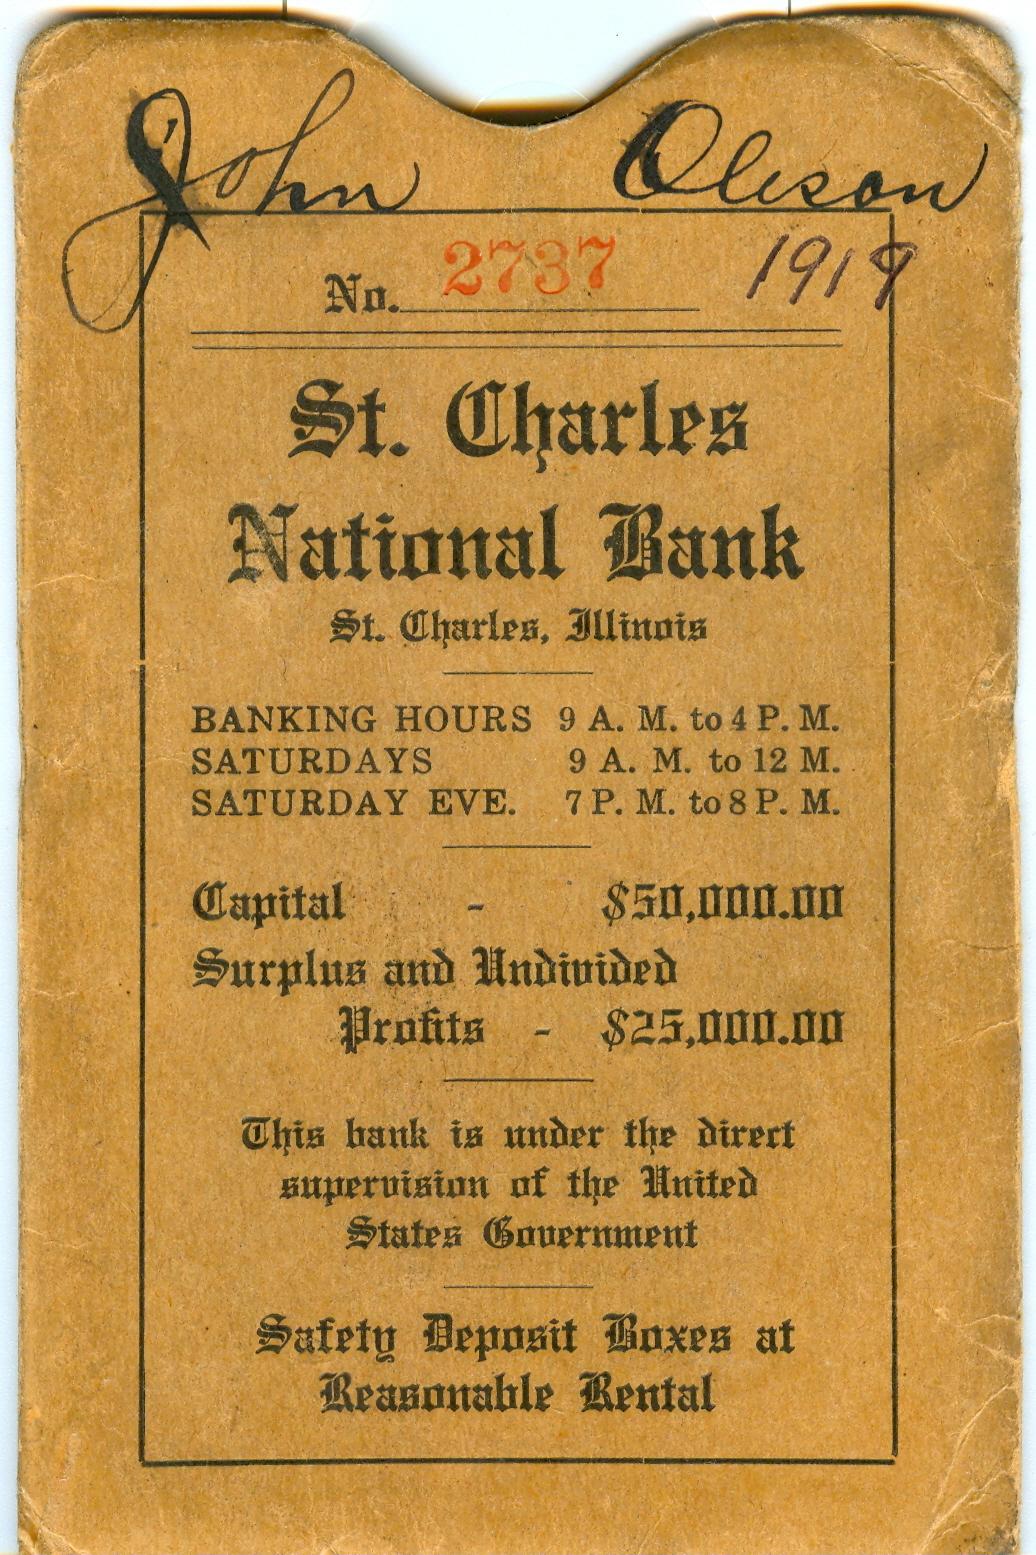 St. Charles National Bank Savings Book Packet, c. 1919